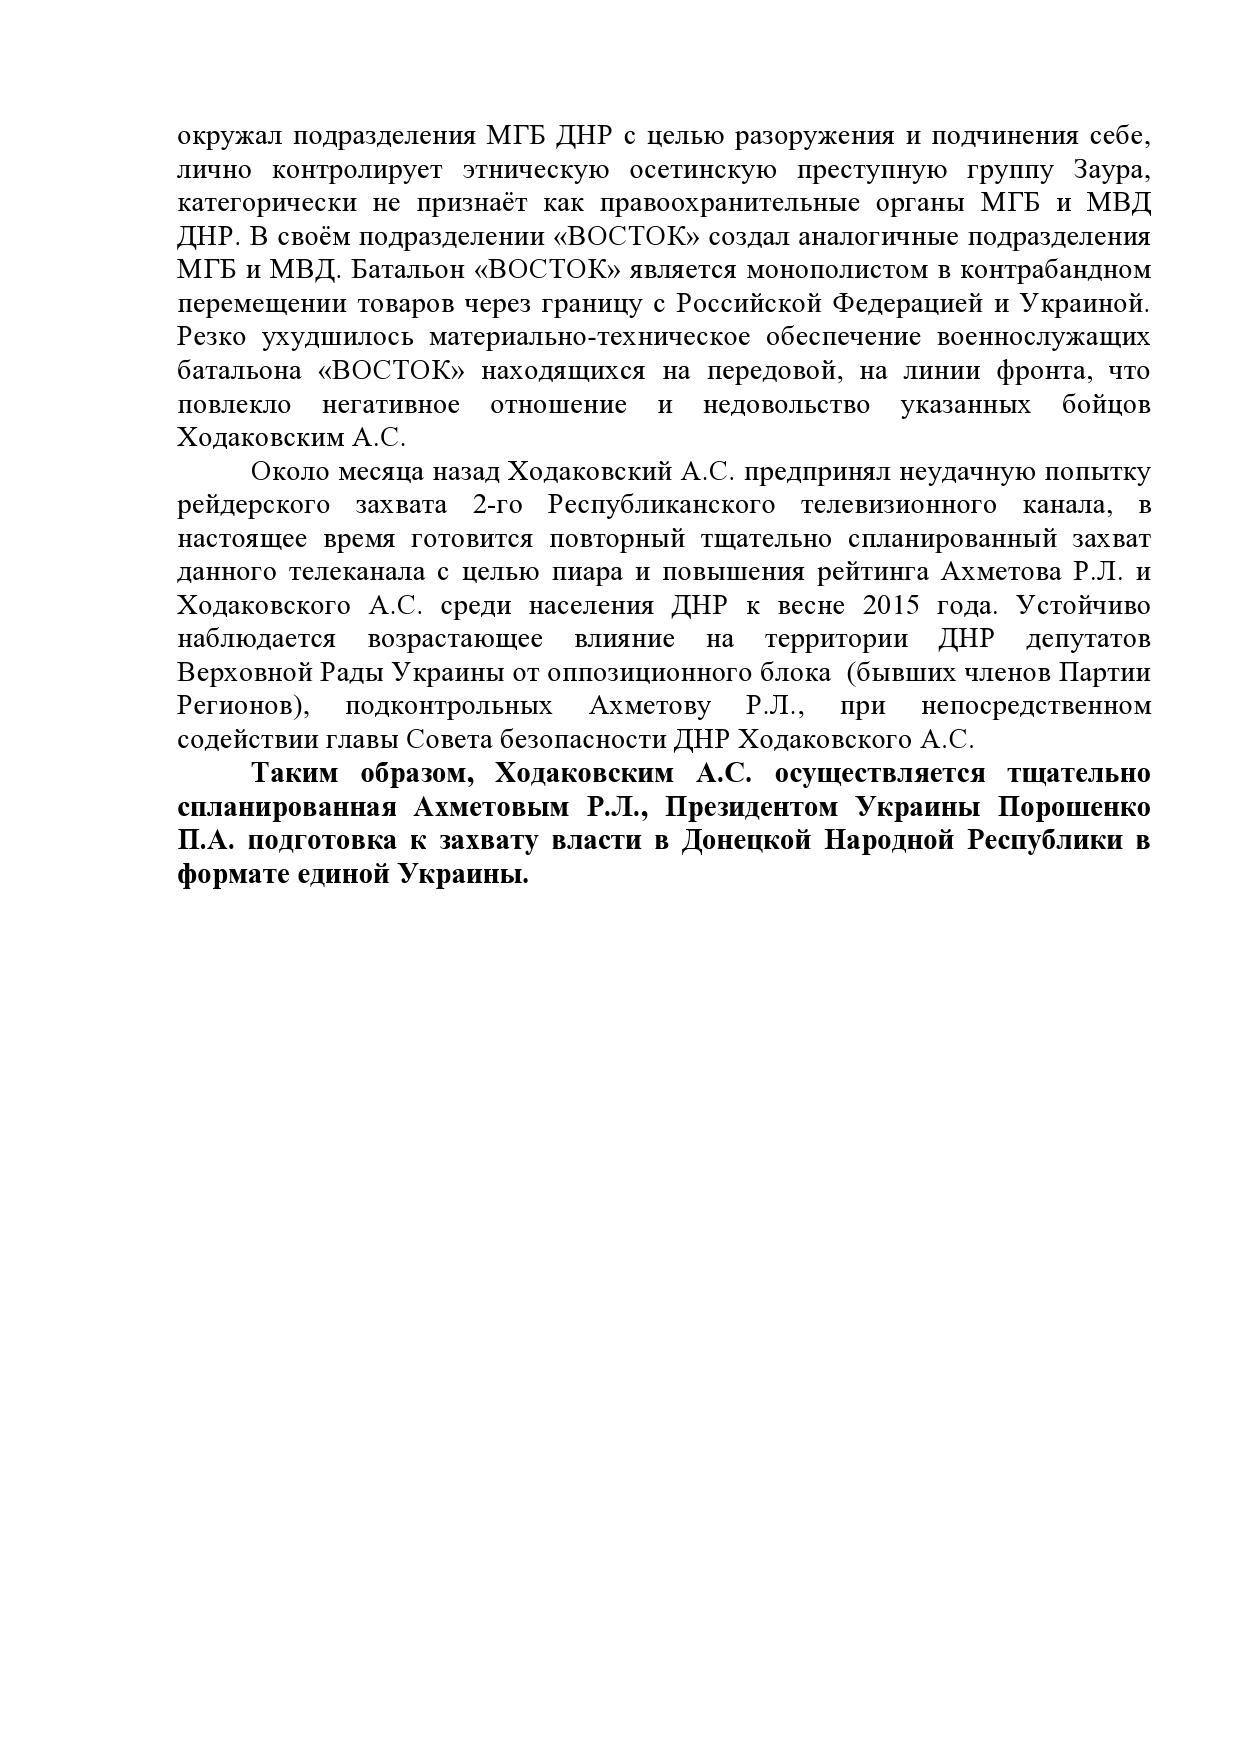 https://b0ltai.files.wordpress.com/2015/09/page0007.jpg